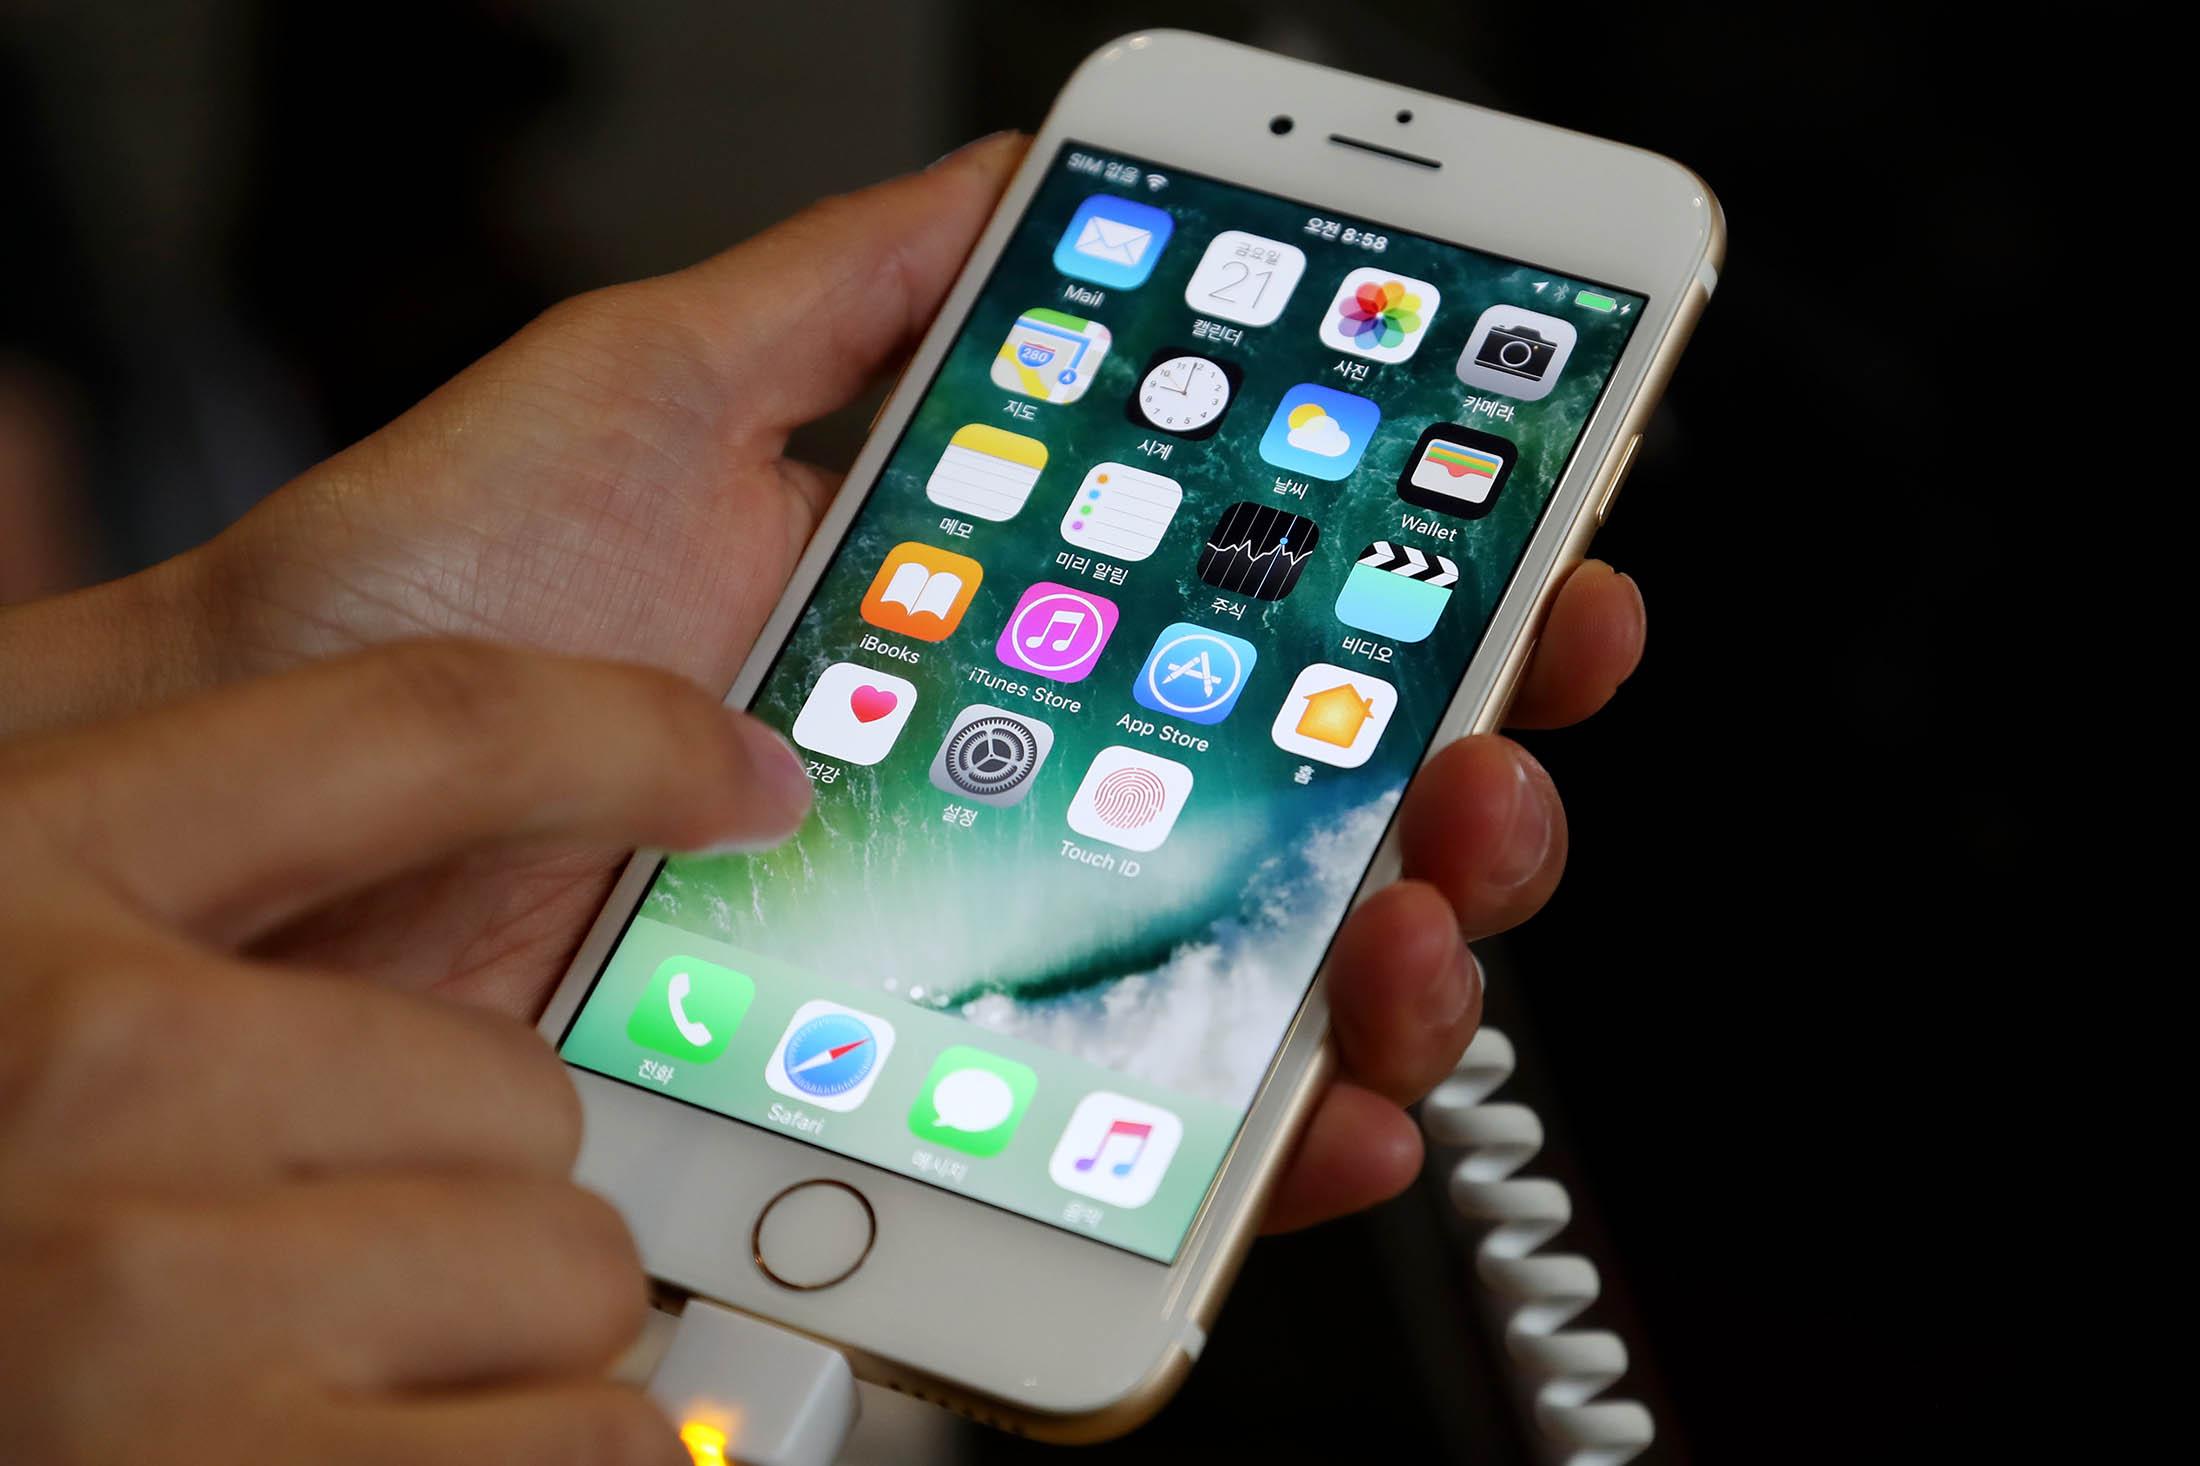 iPhone ποιότητα ήχου, μουσική, gadgets